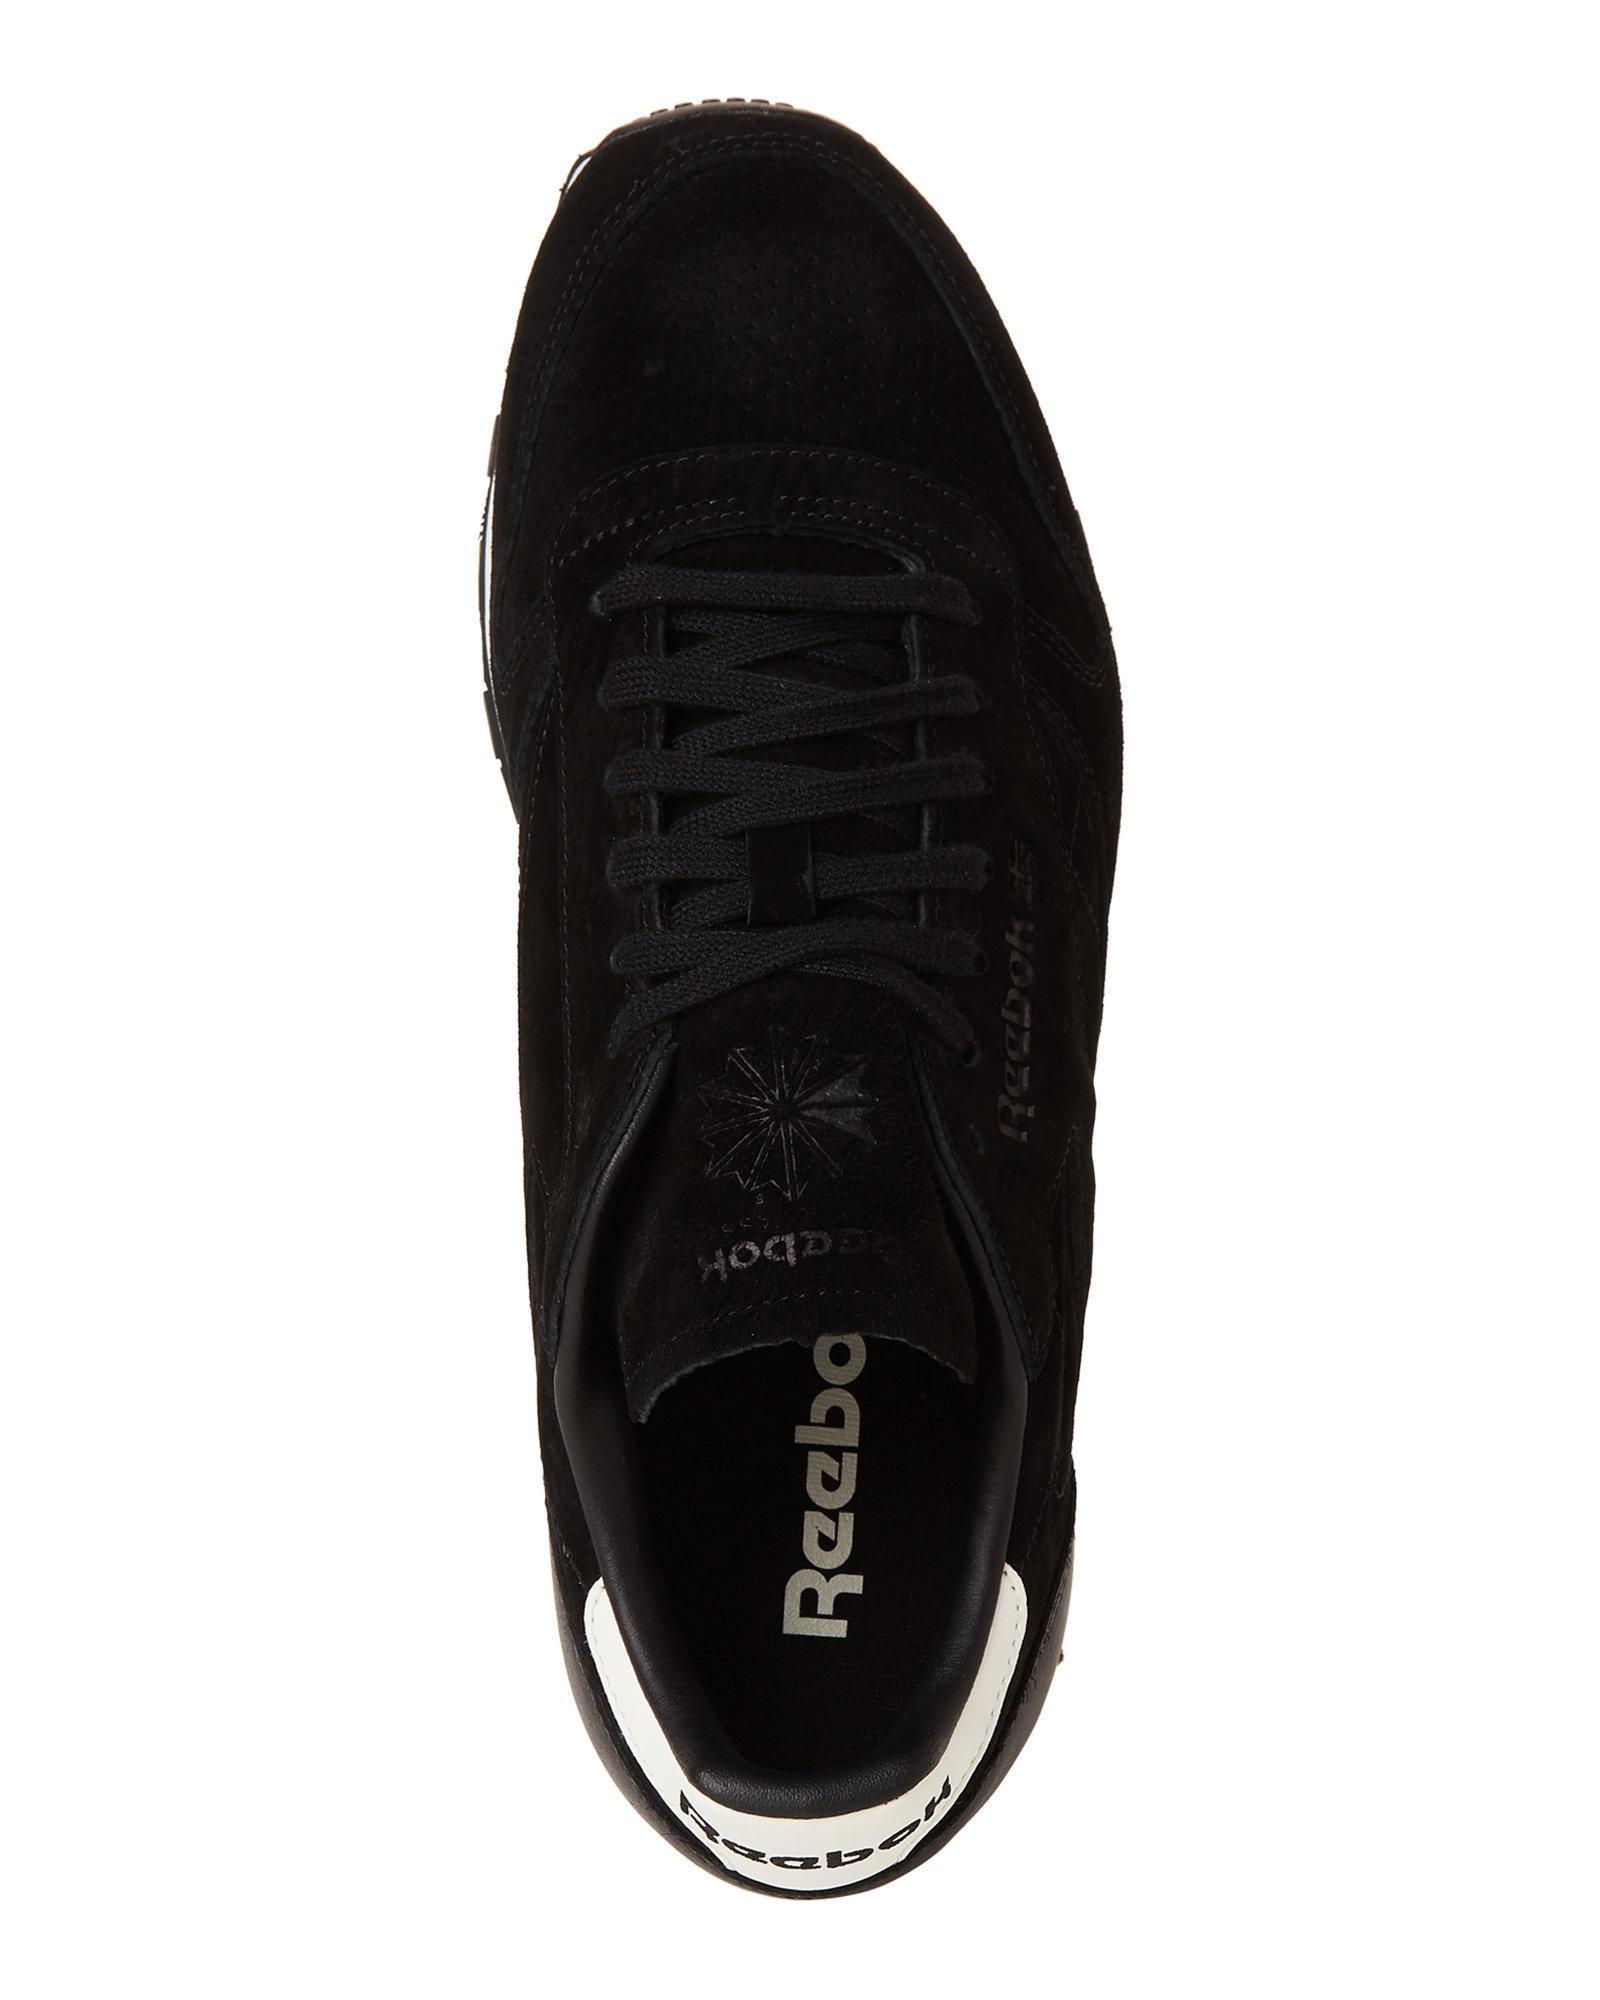 Lyst - Reebok Black   Chalk Classic Suede Low-top Sneakers in Black ... f1f1a4b8d